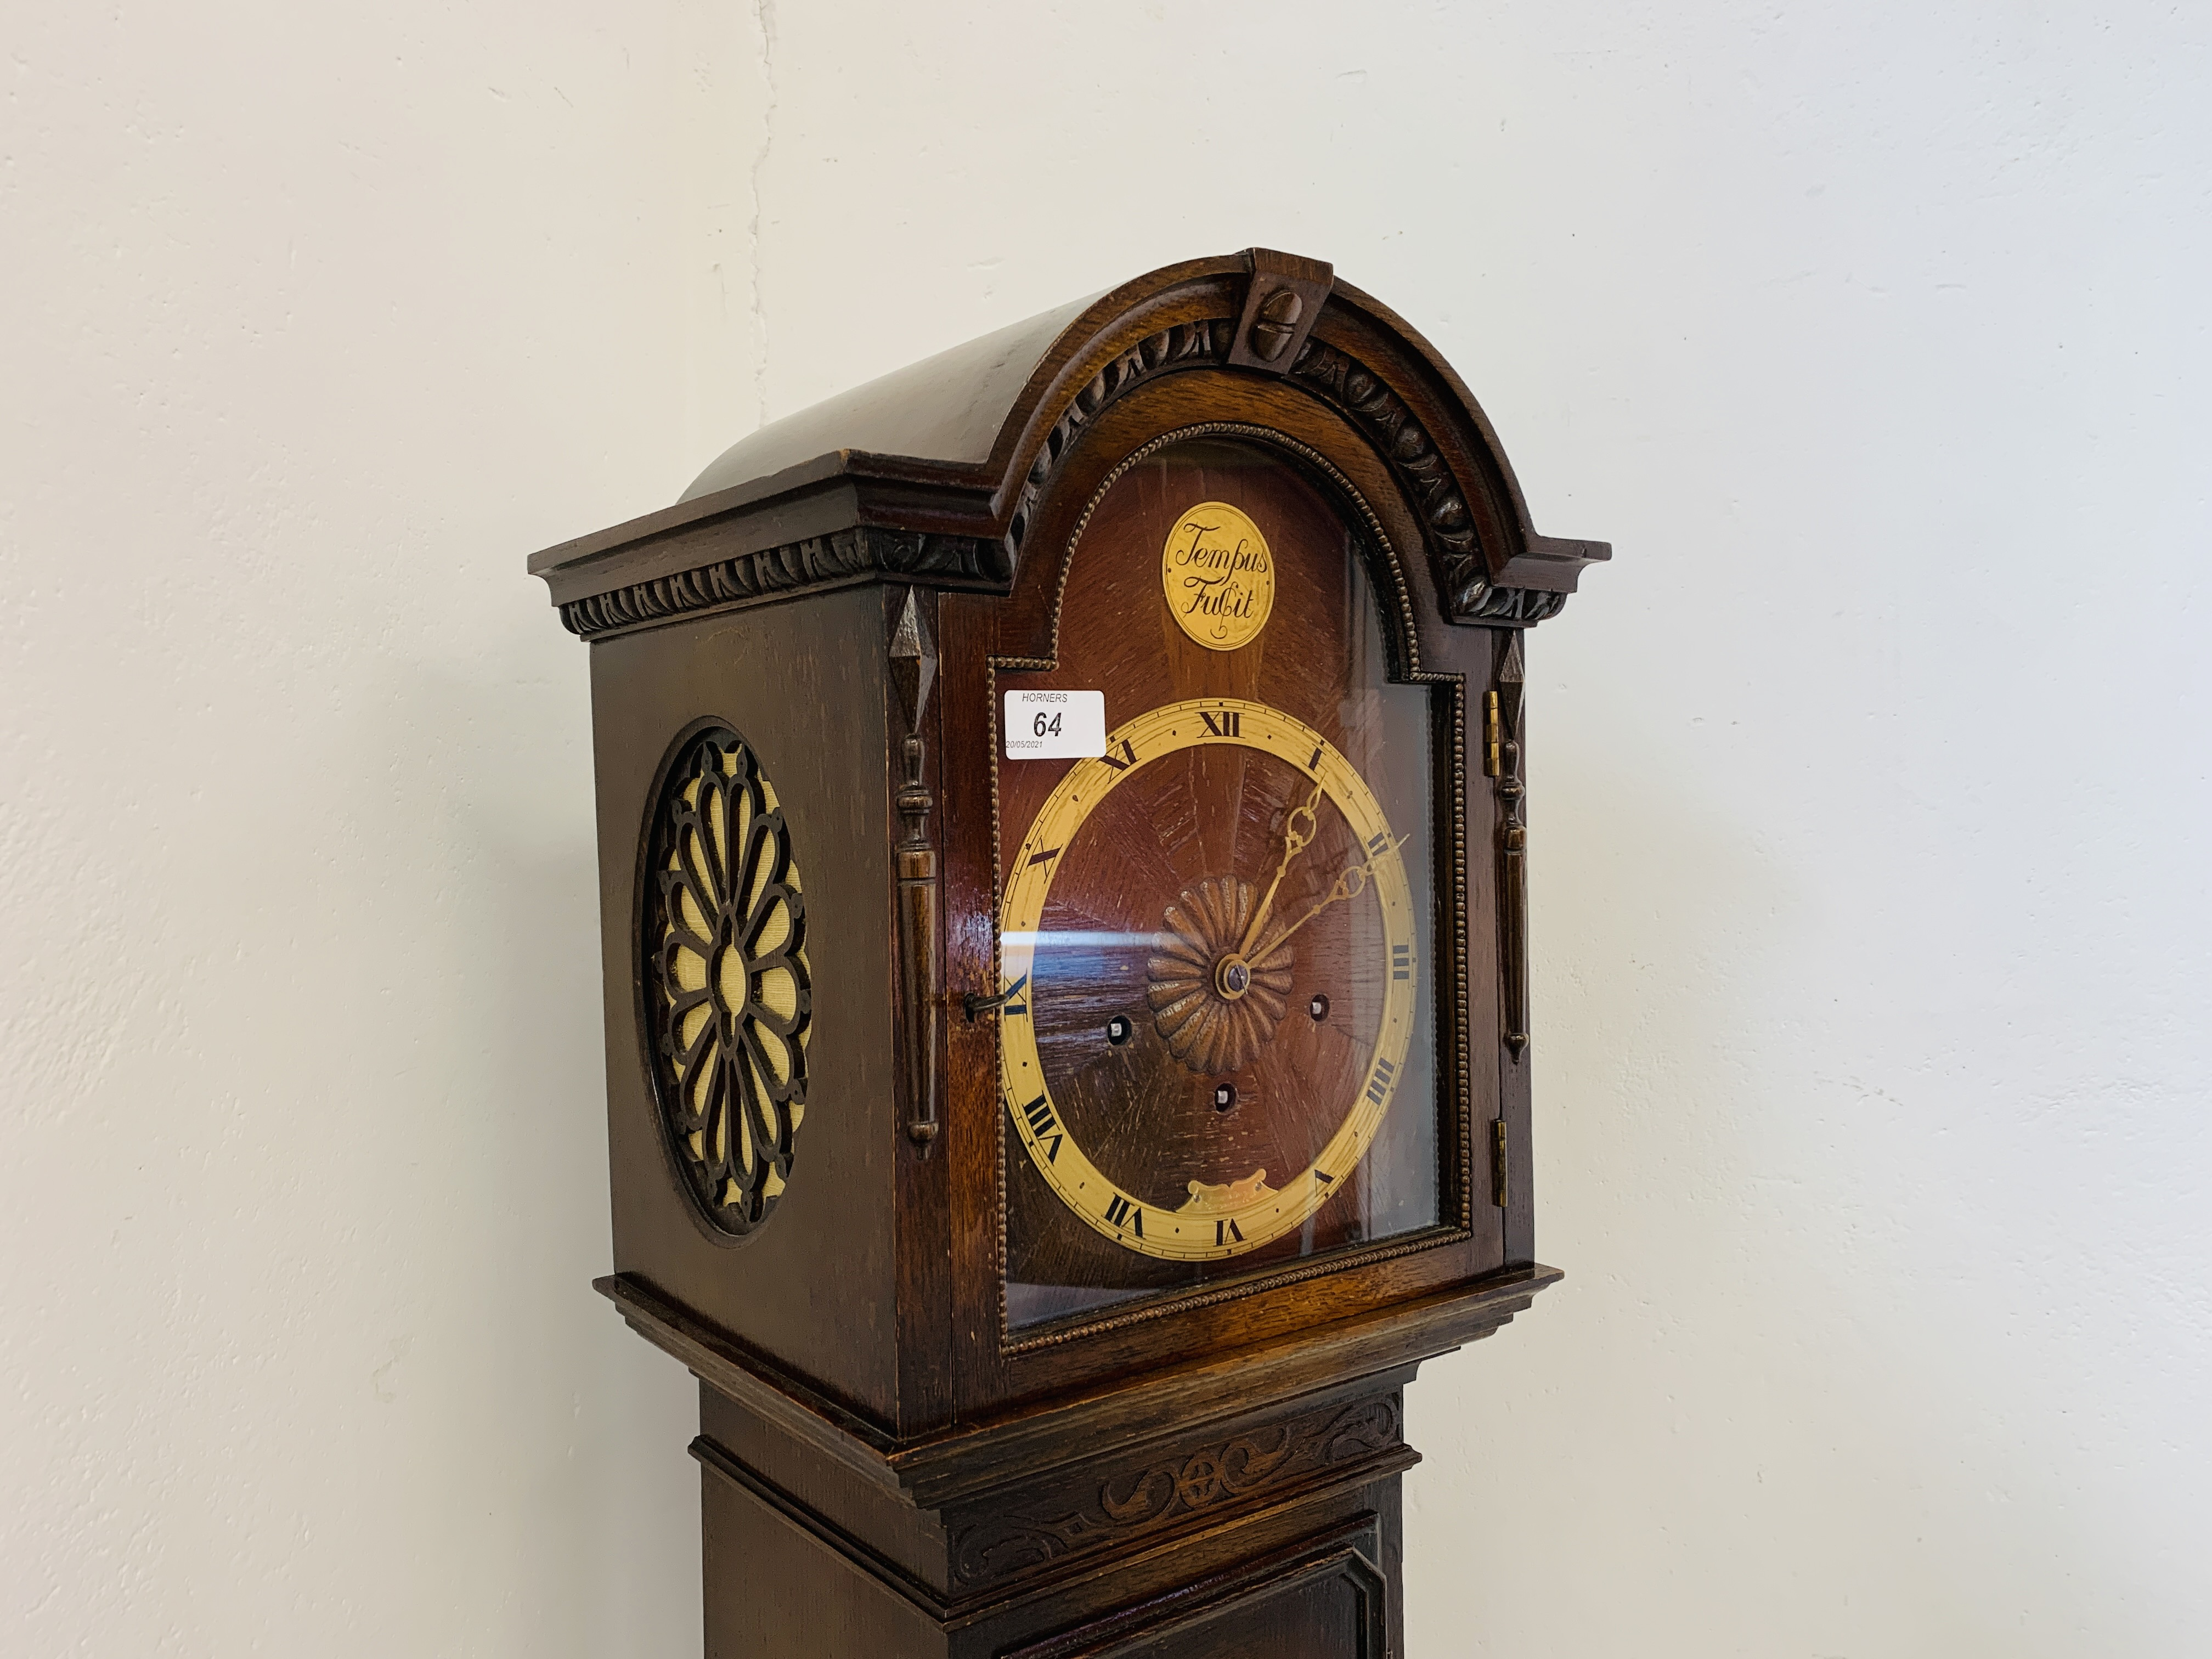 A 1940'S OAK CASED GRANDMOTHER CLOCK, - Image 4 of 12